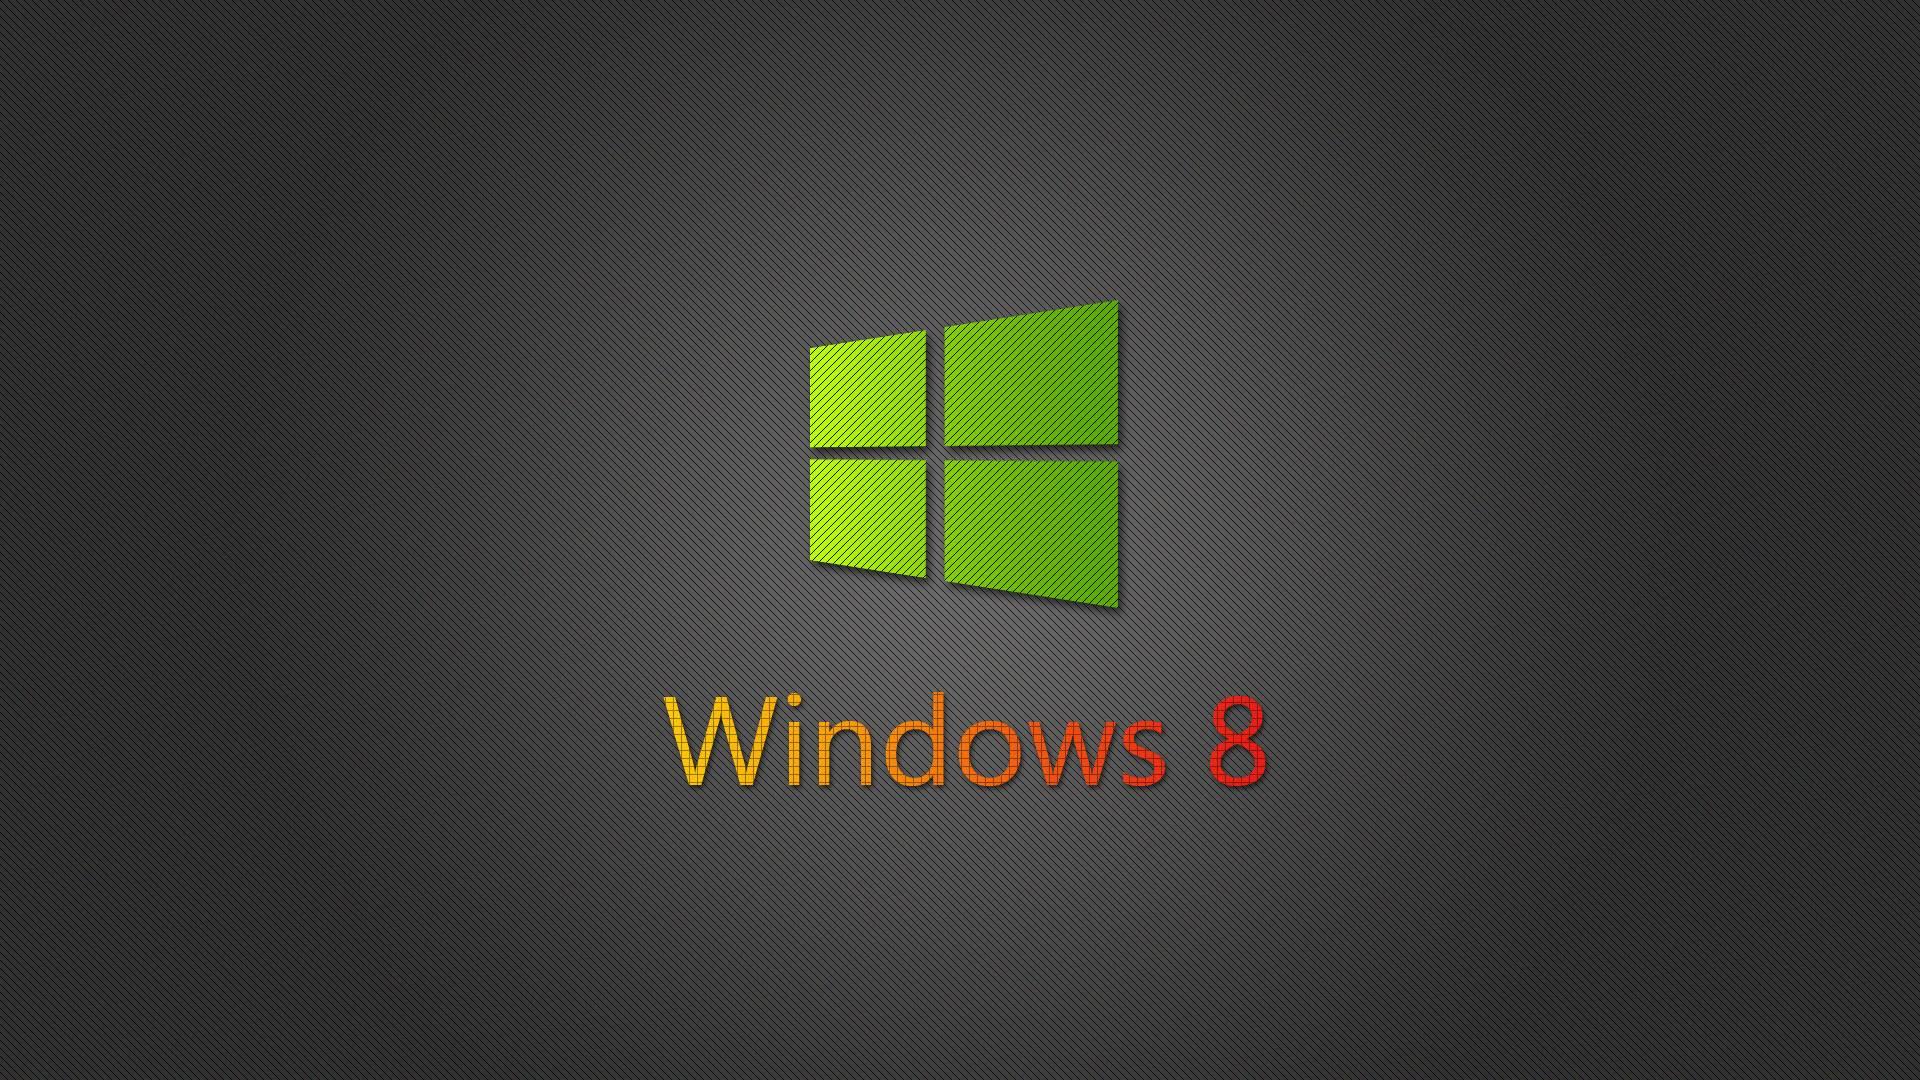 windows 8 wallpapers 1080p wallpaper cave